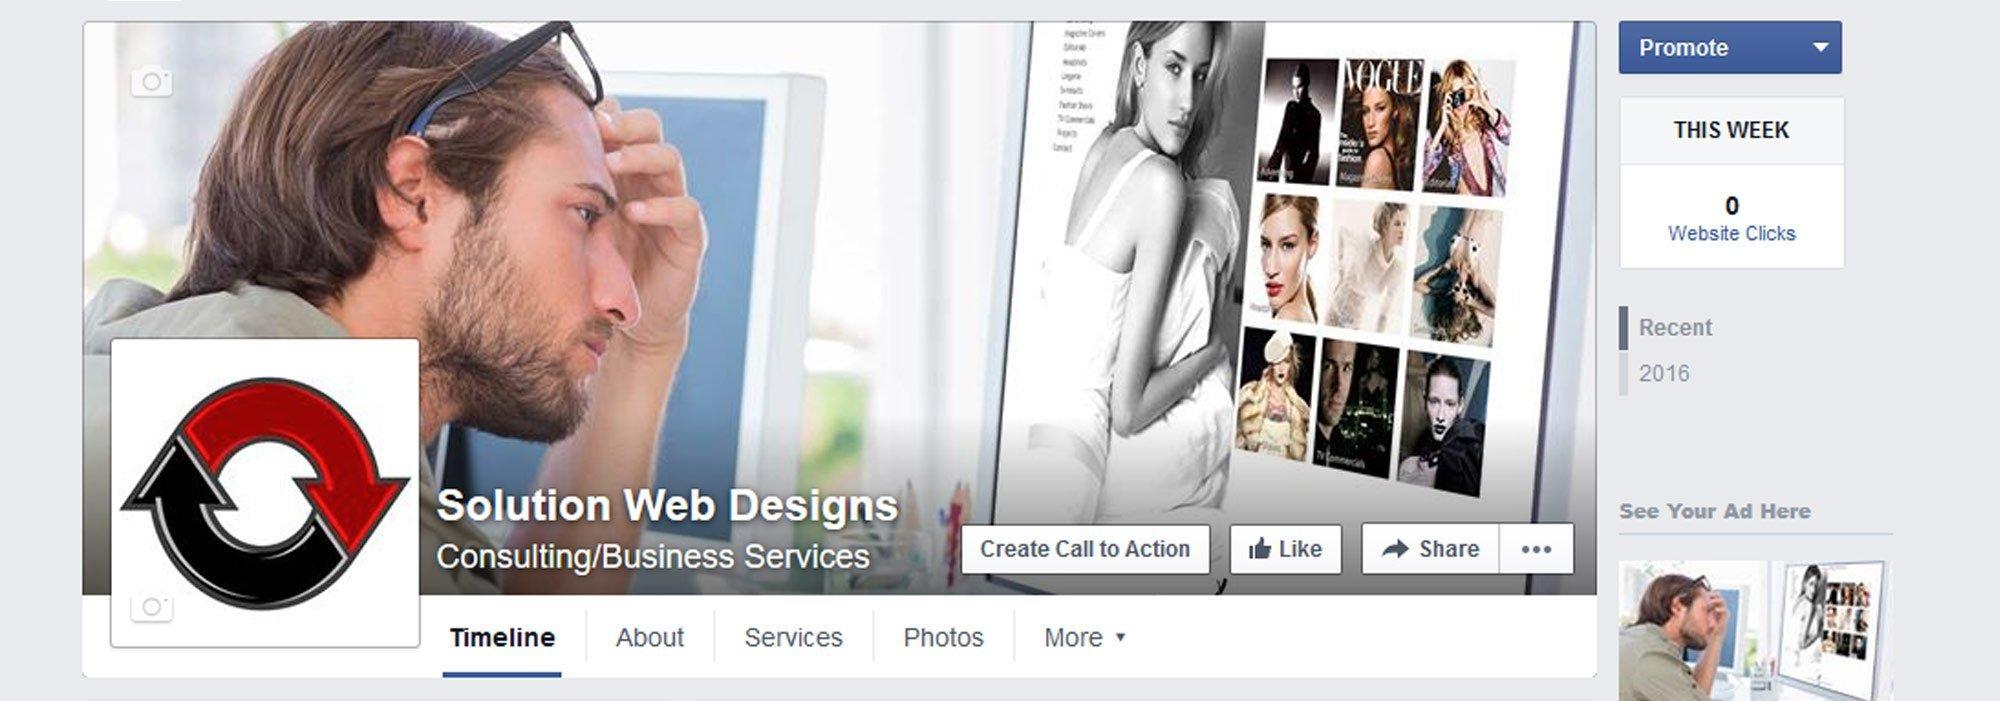 Facebook Marketing Agency Solution Web Designs